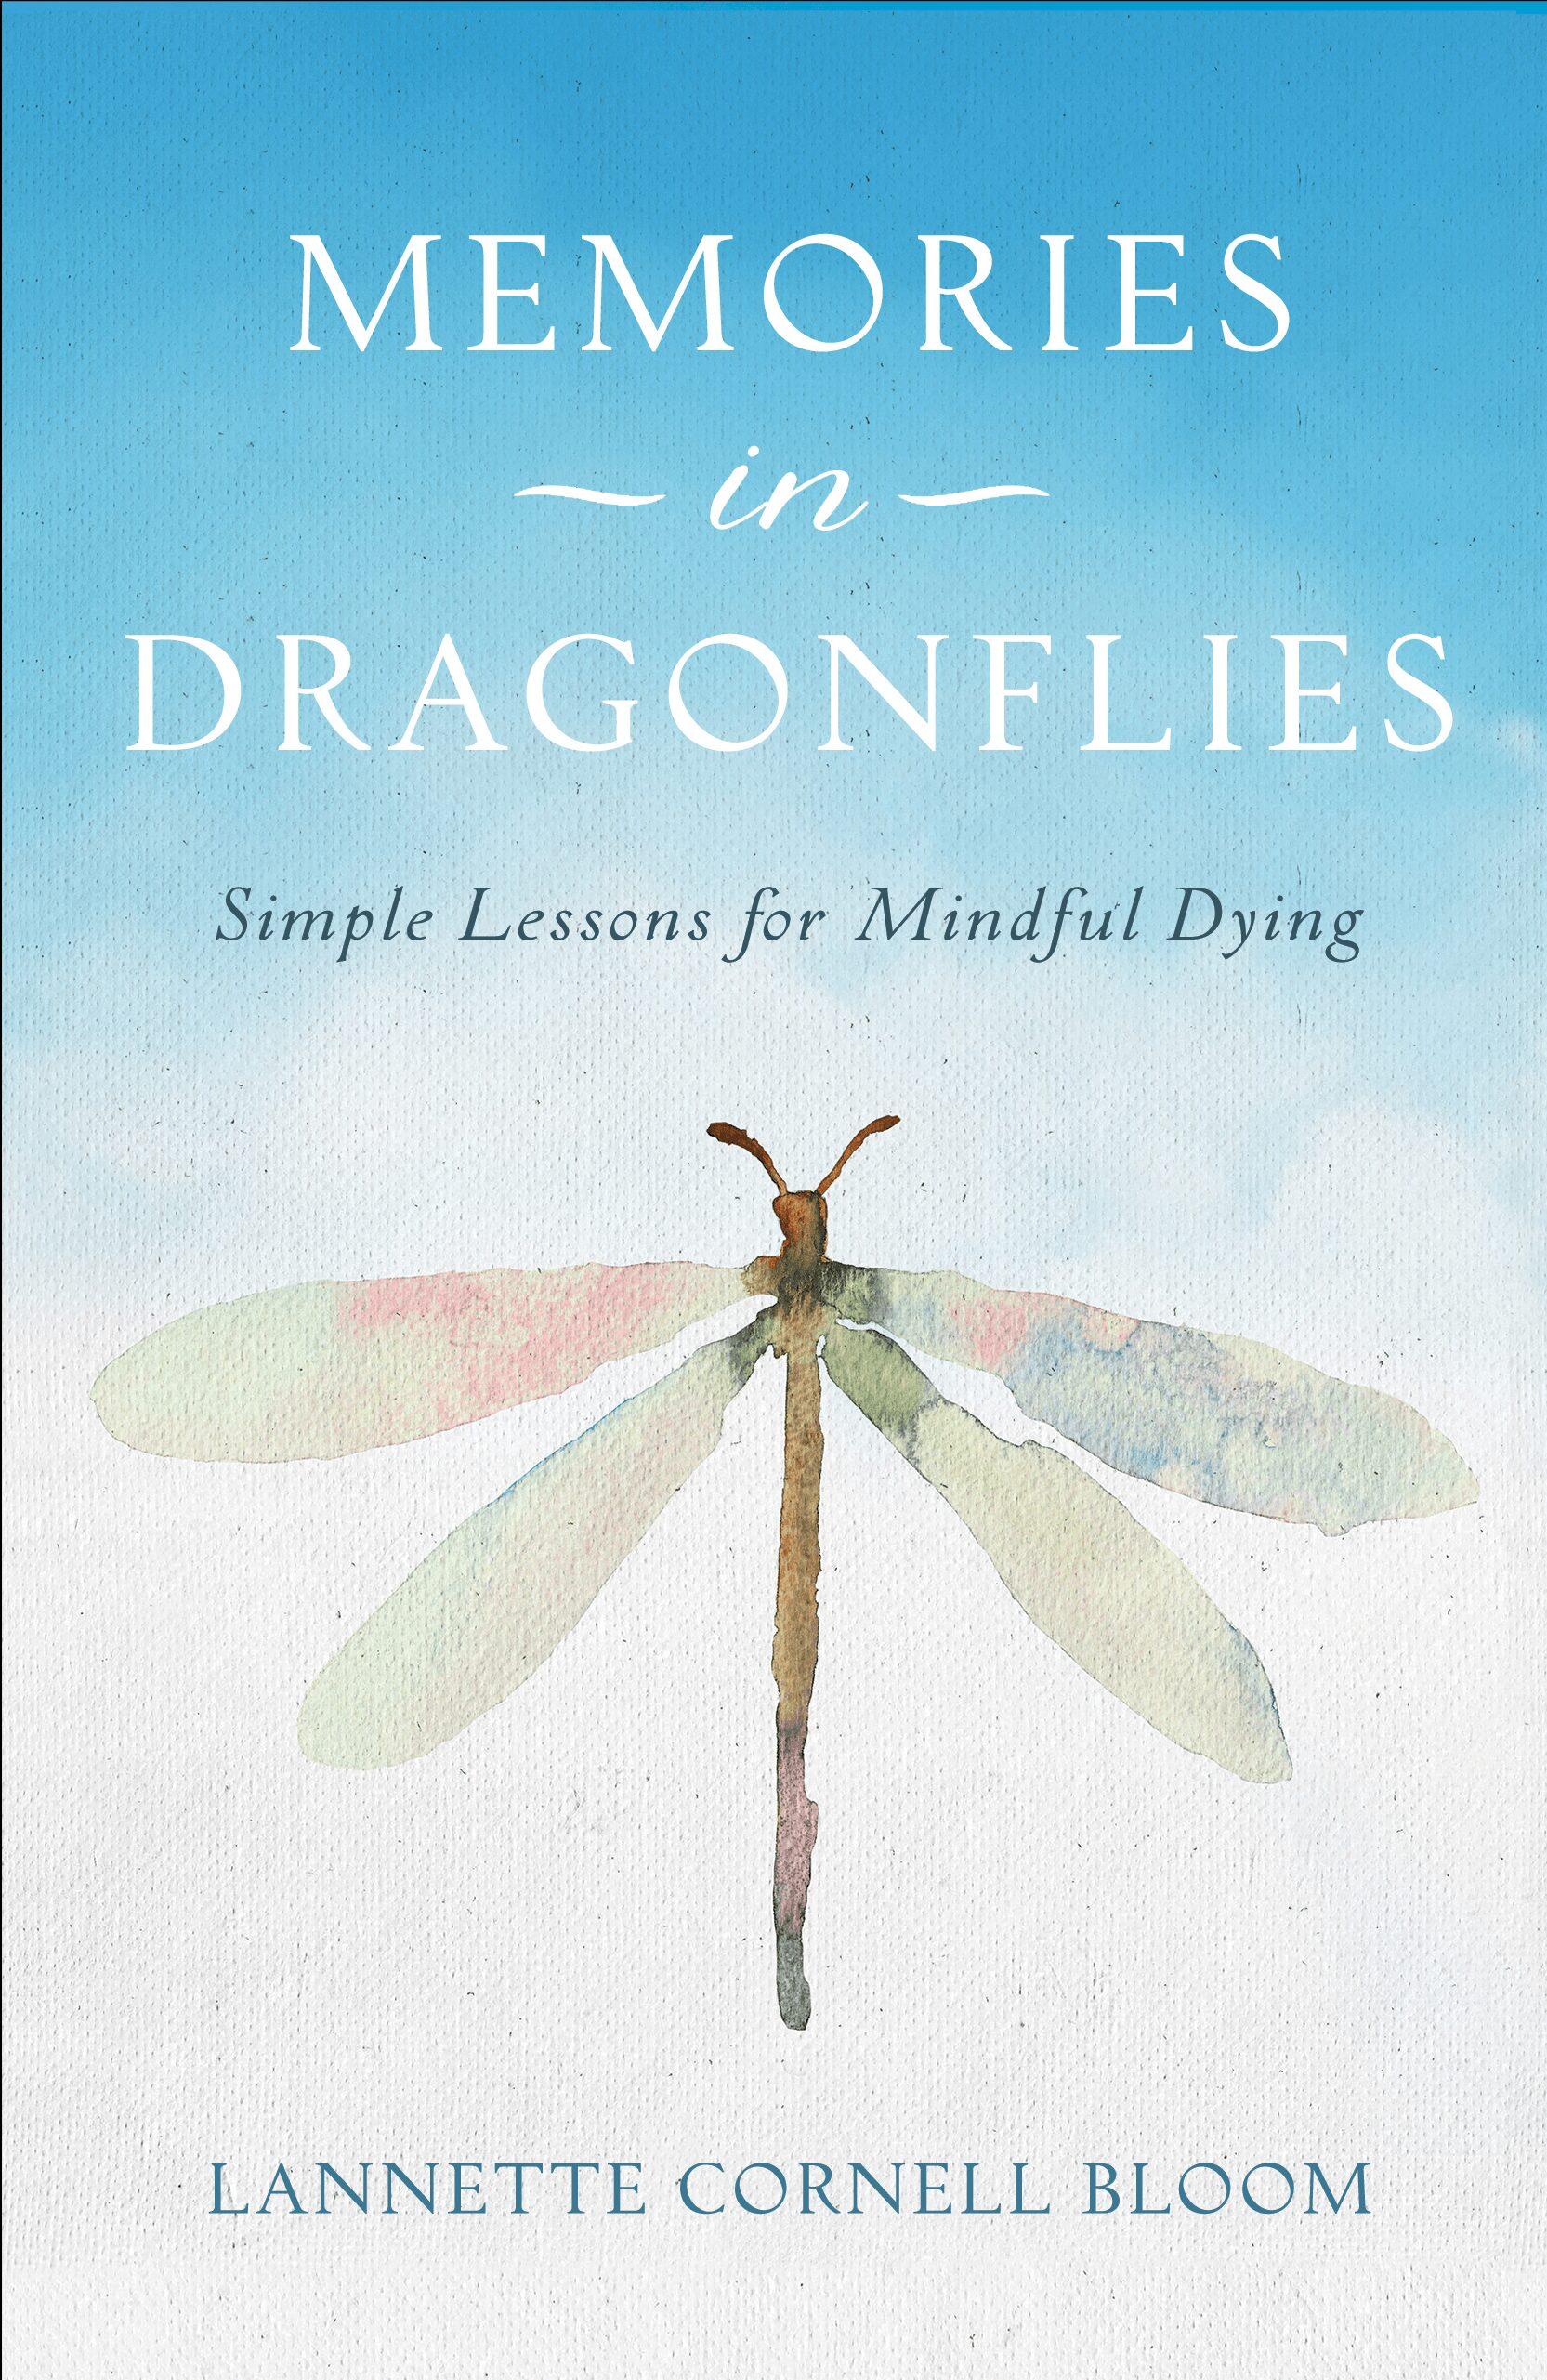 Memories in Dragonflies by Lannette Cornell Bloom